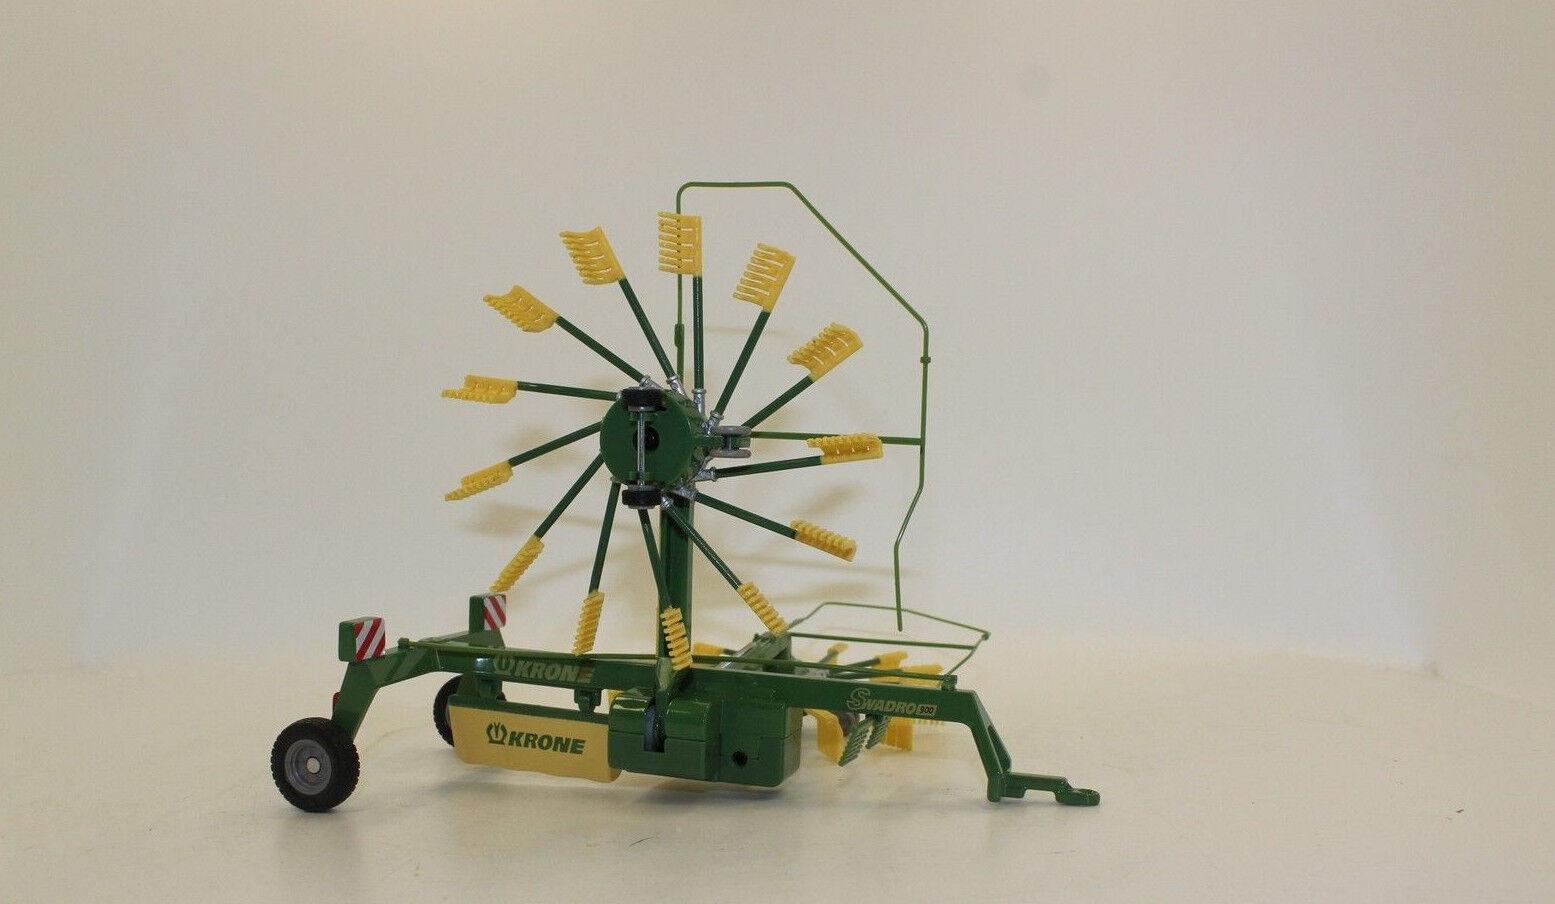 Siku 6782 2 trompo schwader Farmer tractor 1 32 nuevo en OVP